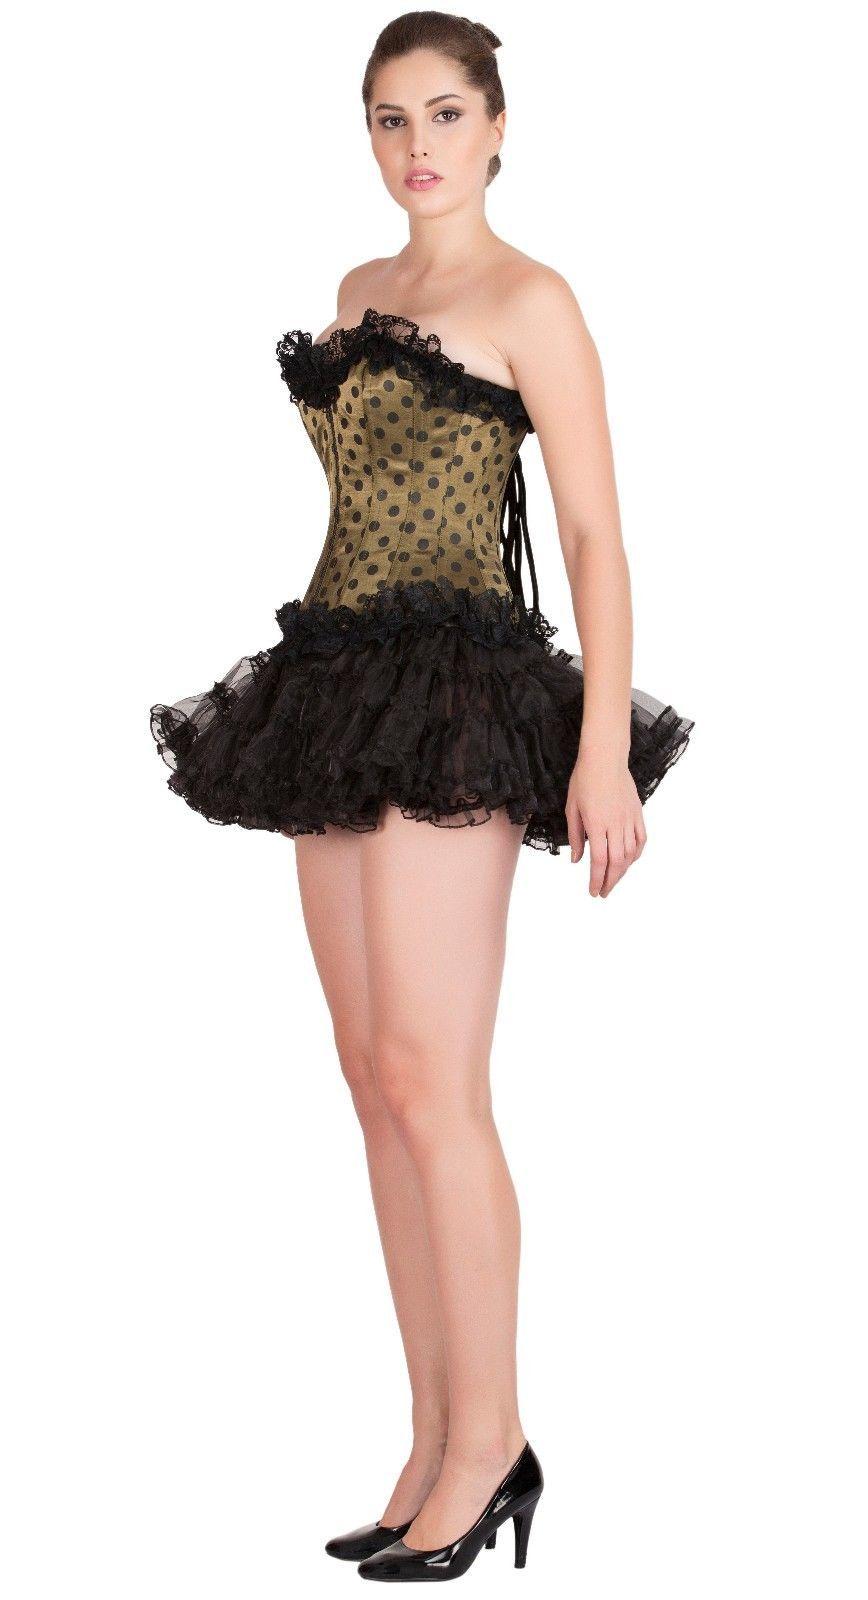 Olive Green Satin Polka Dots Top Tutu Skirt Overbust PLUS SIZE Corset Prom Dress